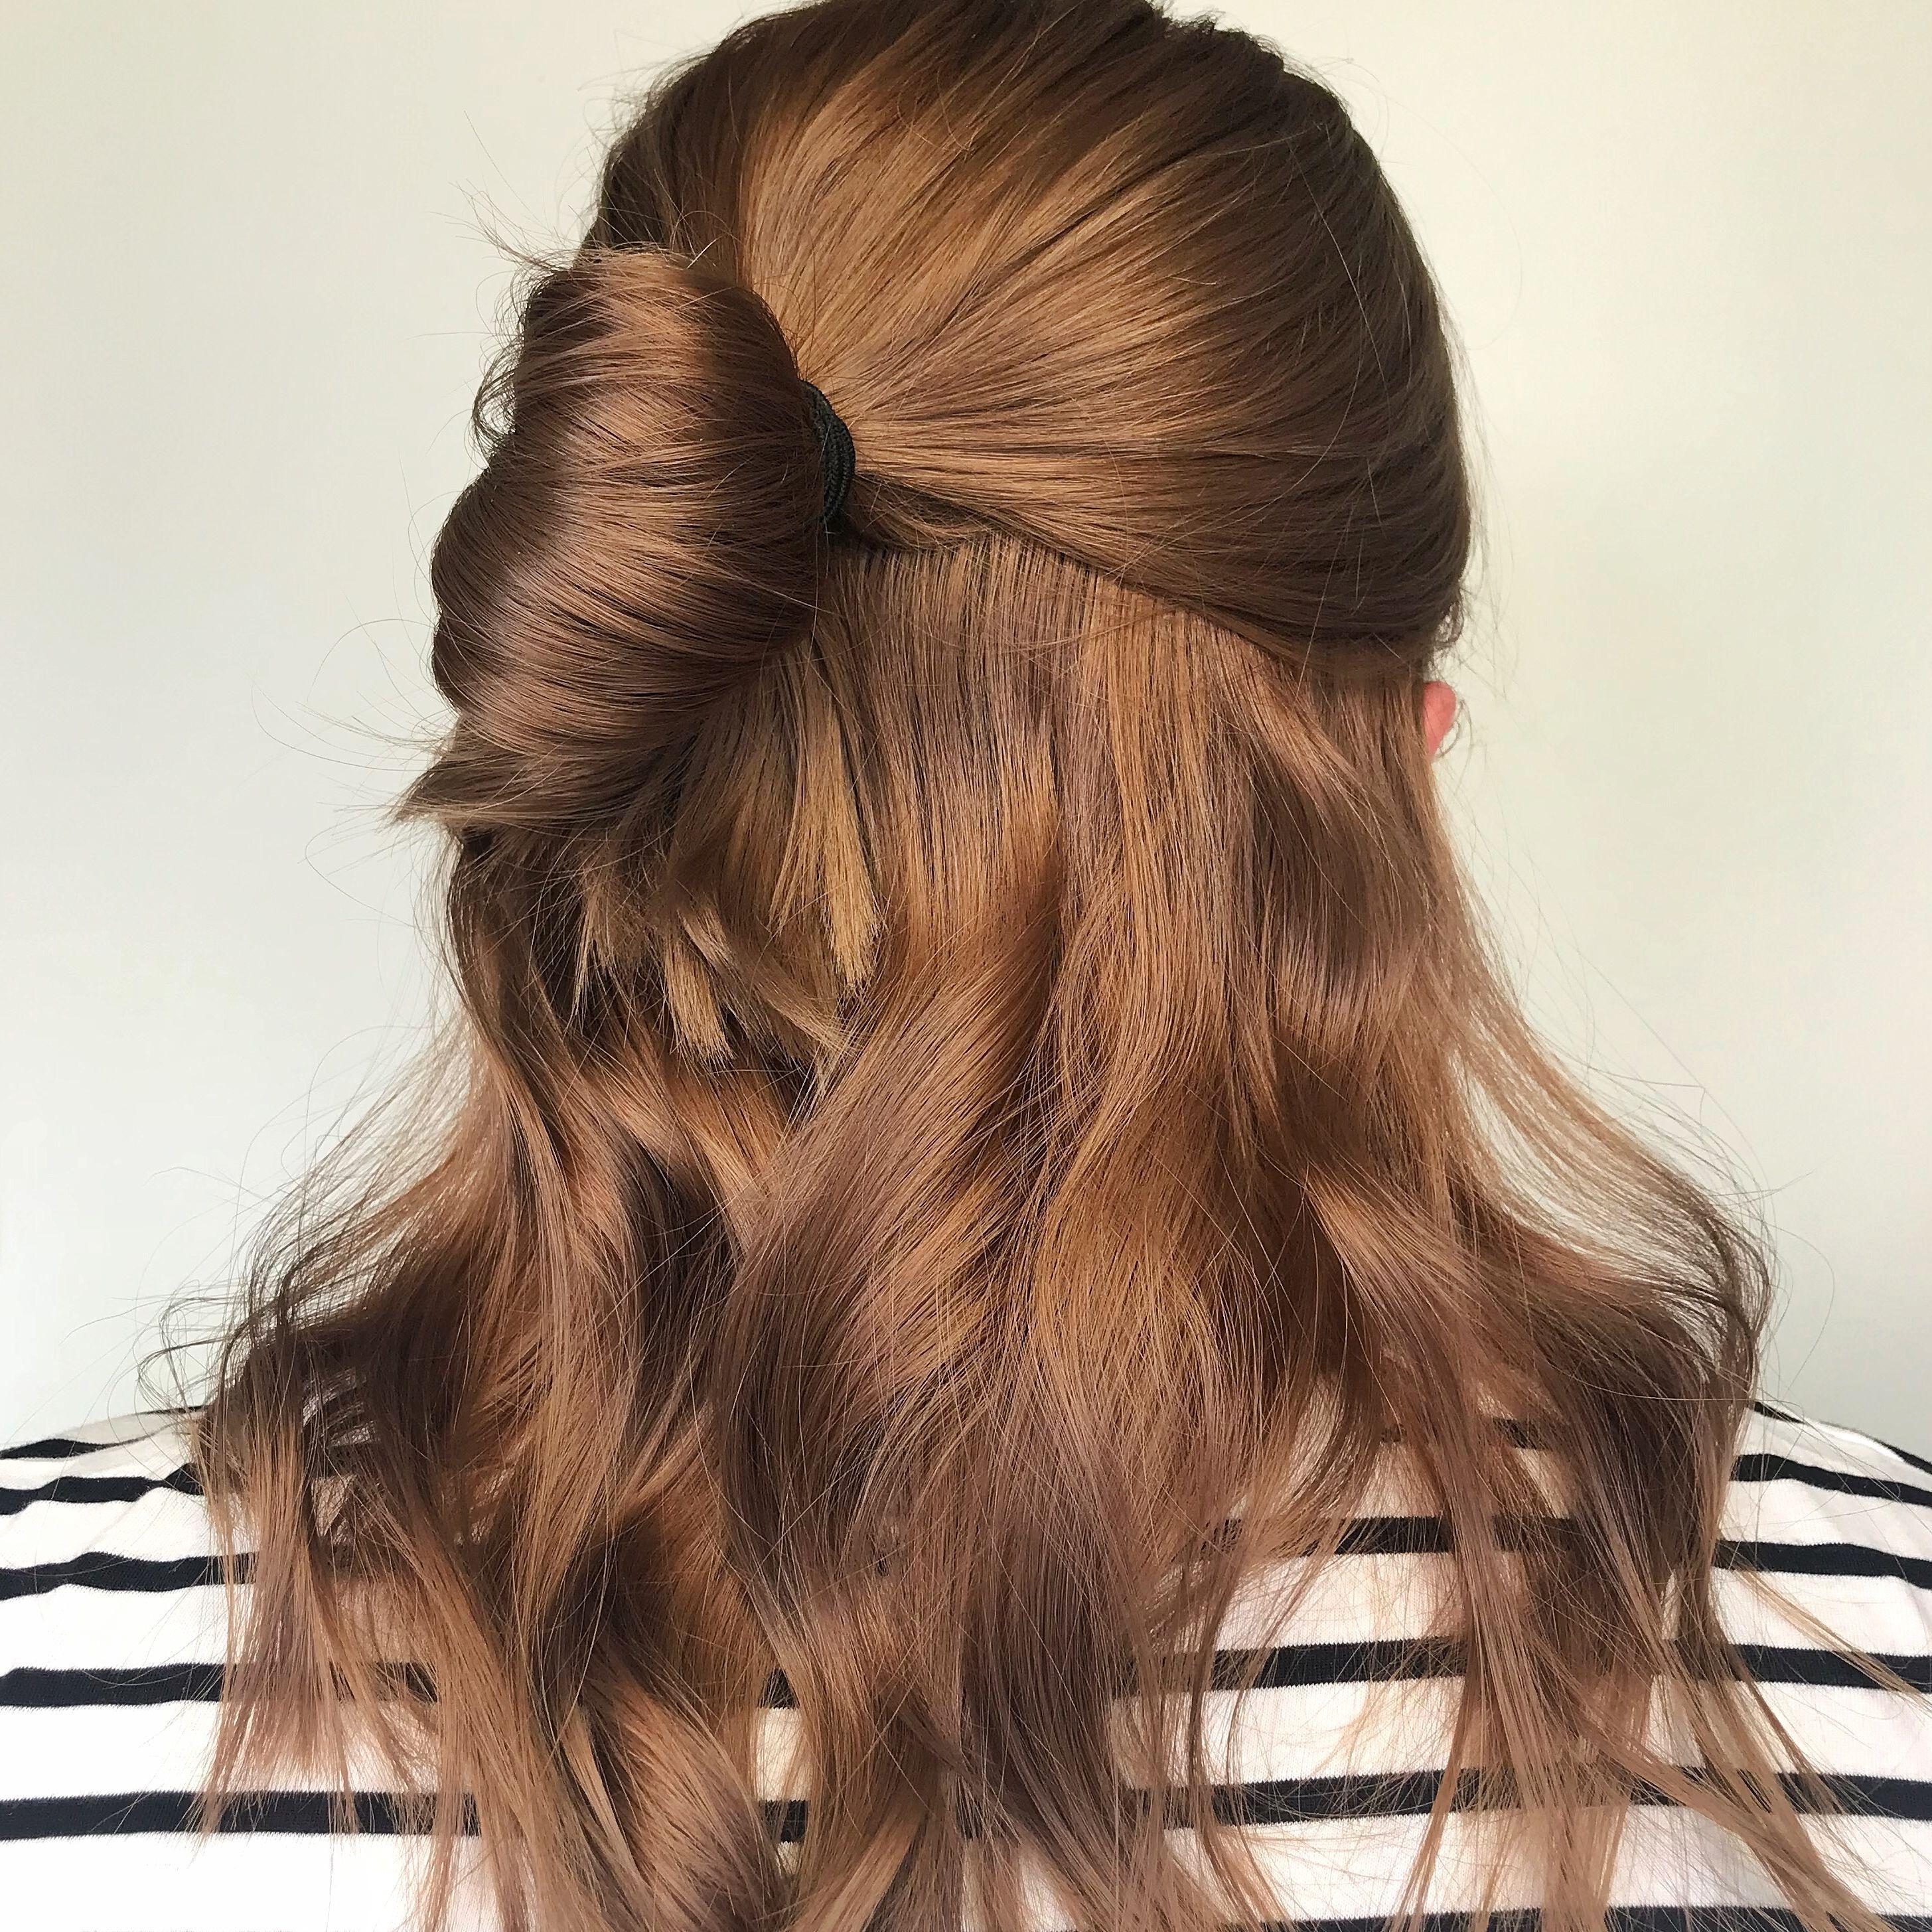 Salted Caramel Blonde In 2020 Hair Color Caramel Caramel Blonde